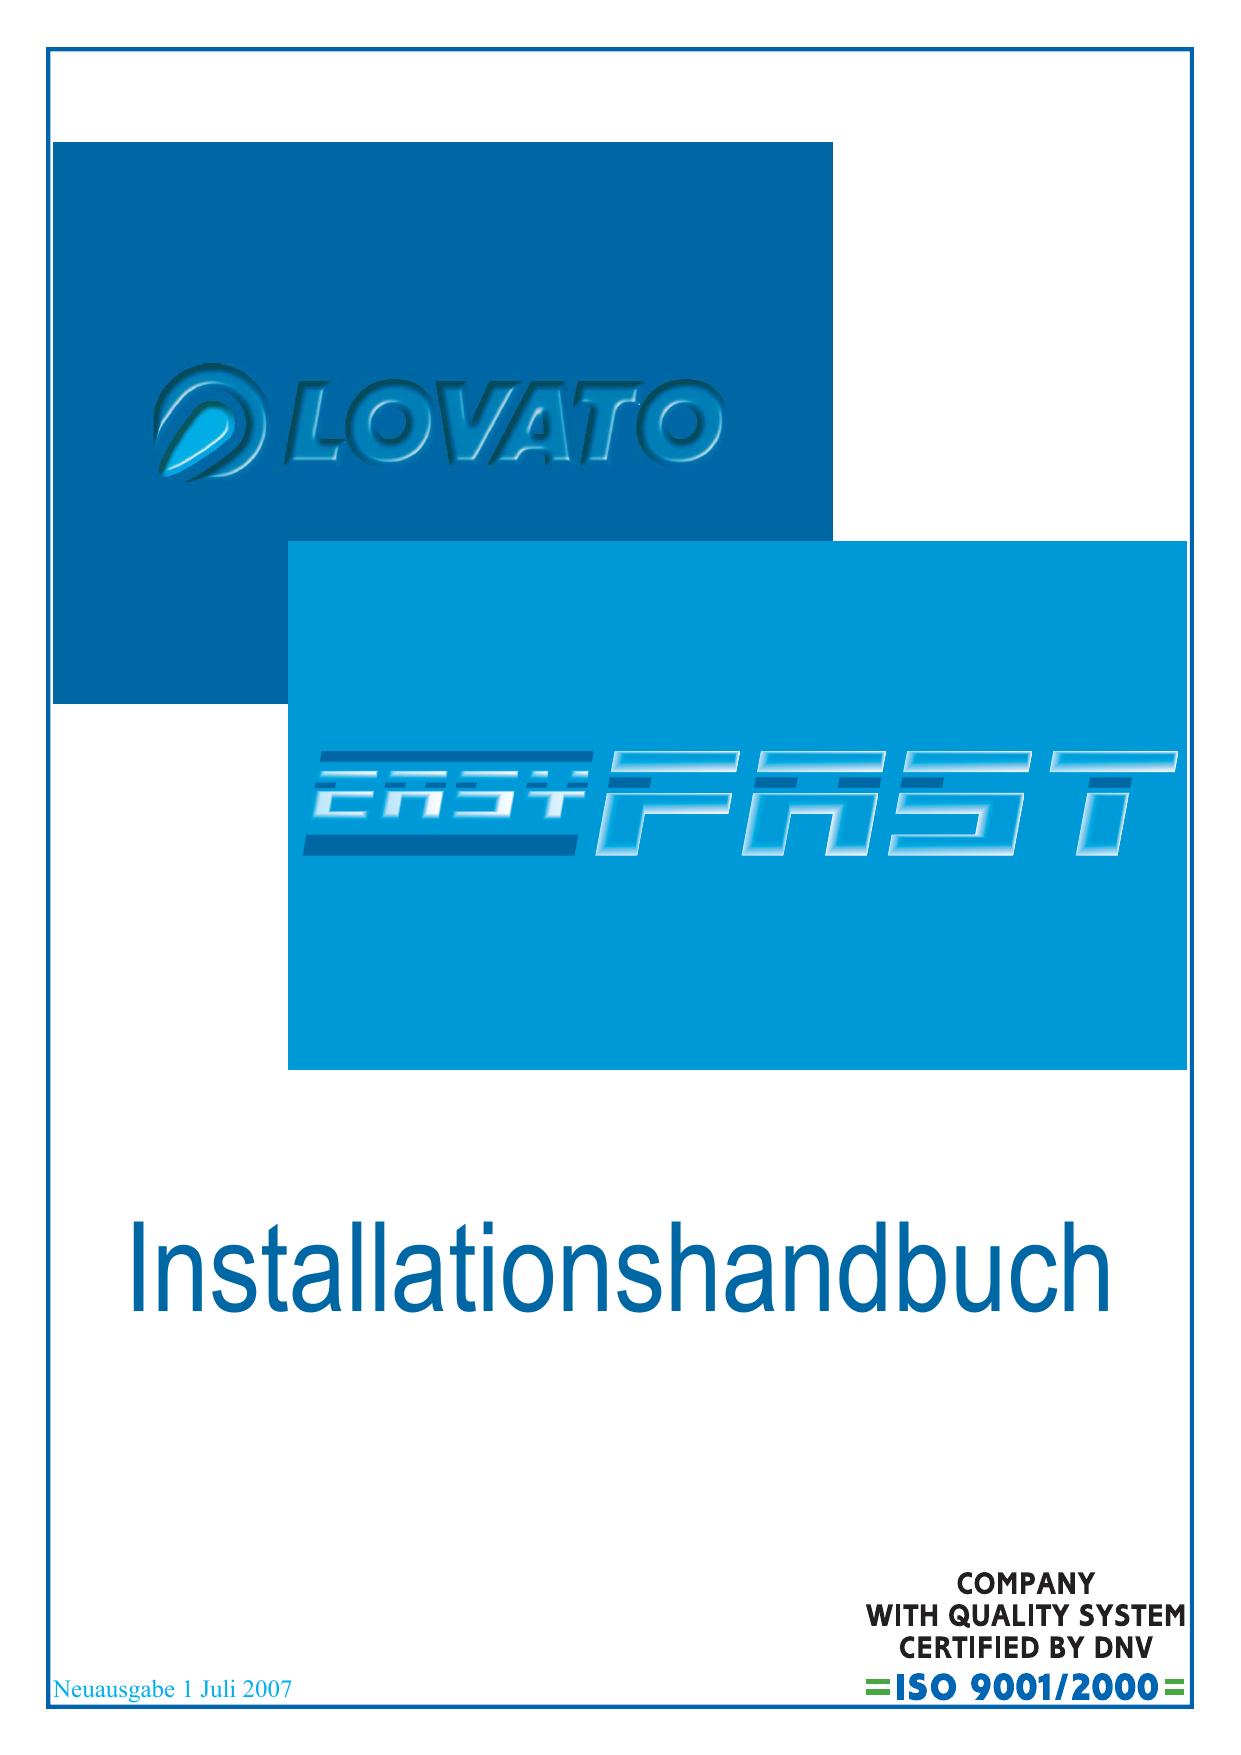 Installationshandbuch | manualzz.com